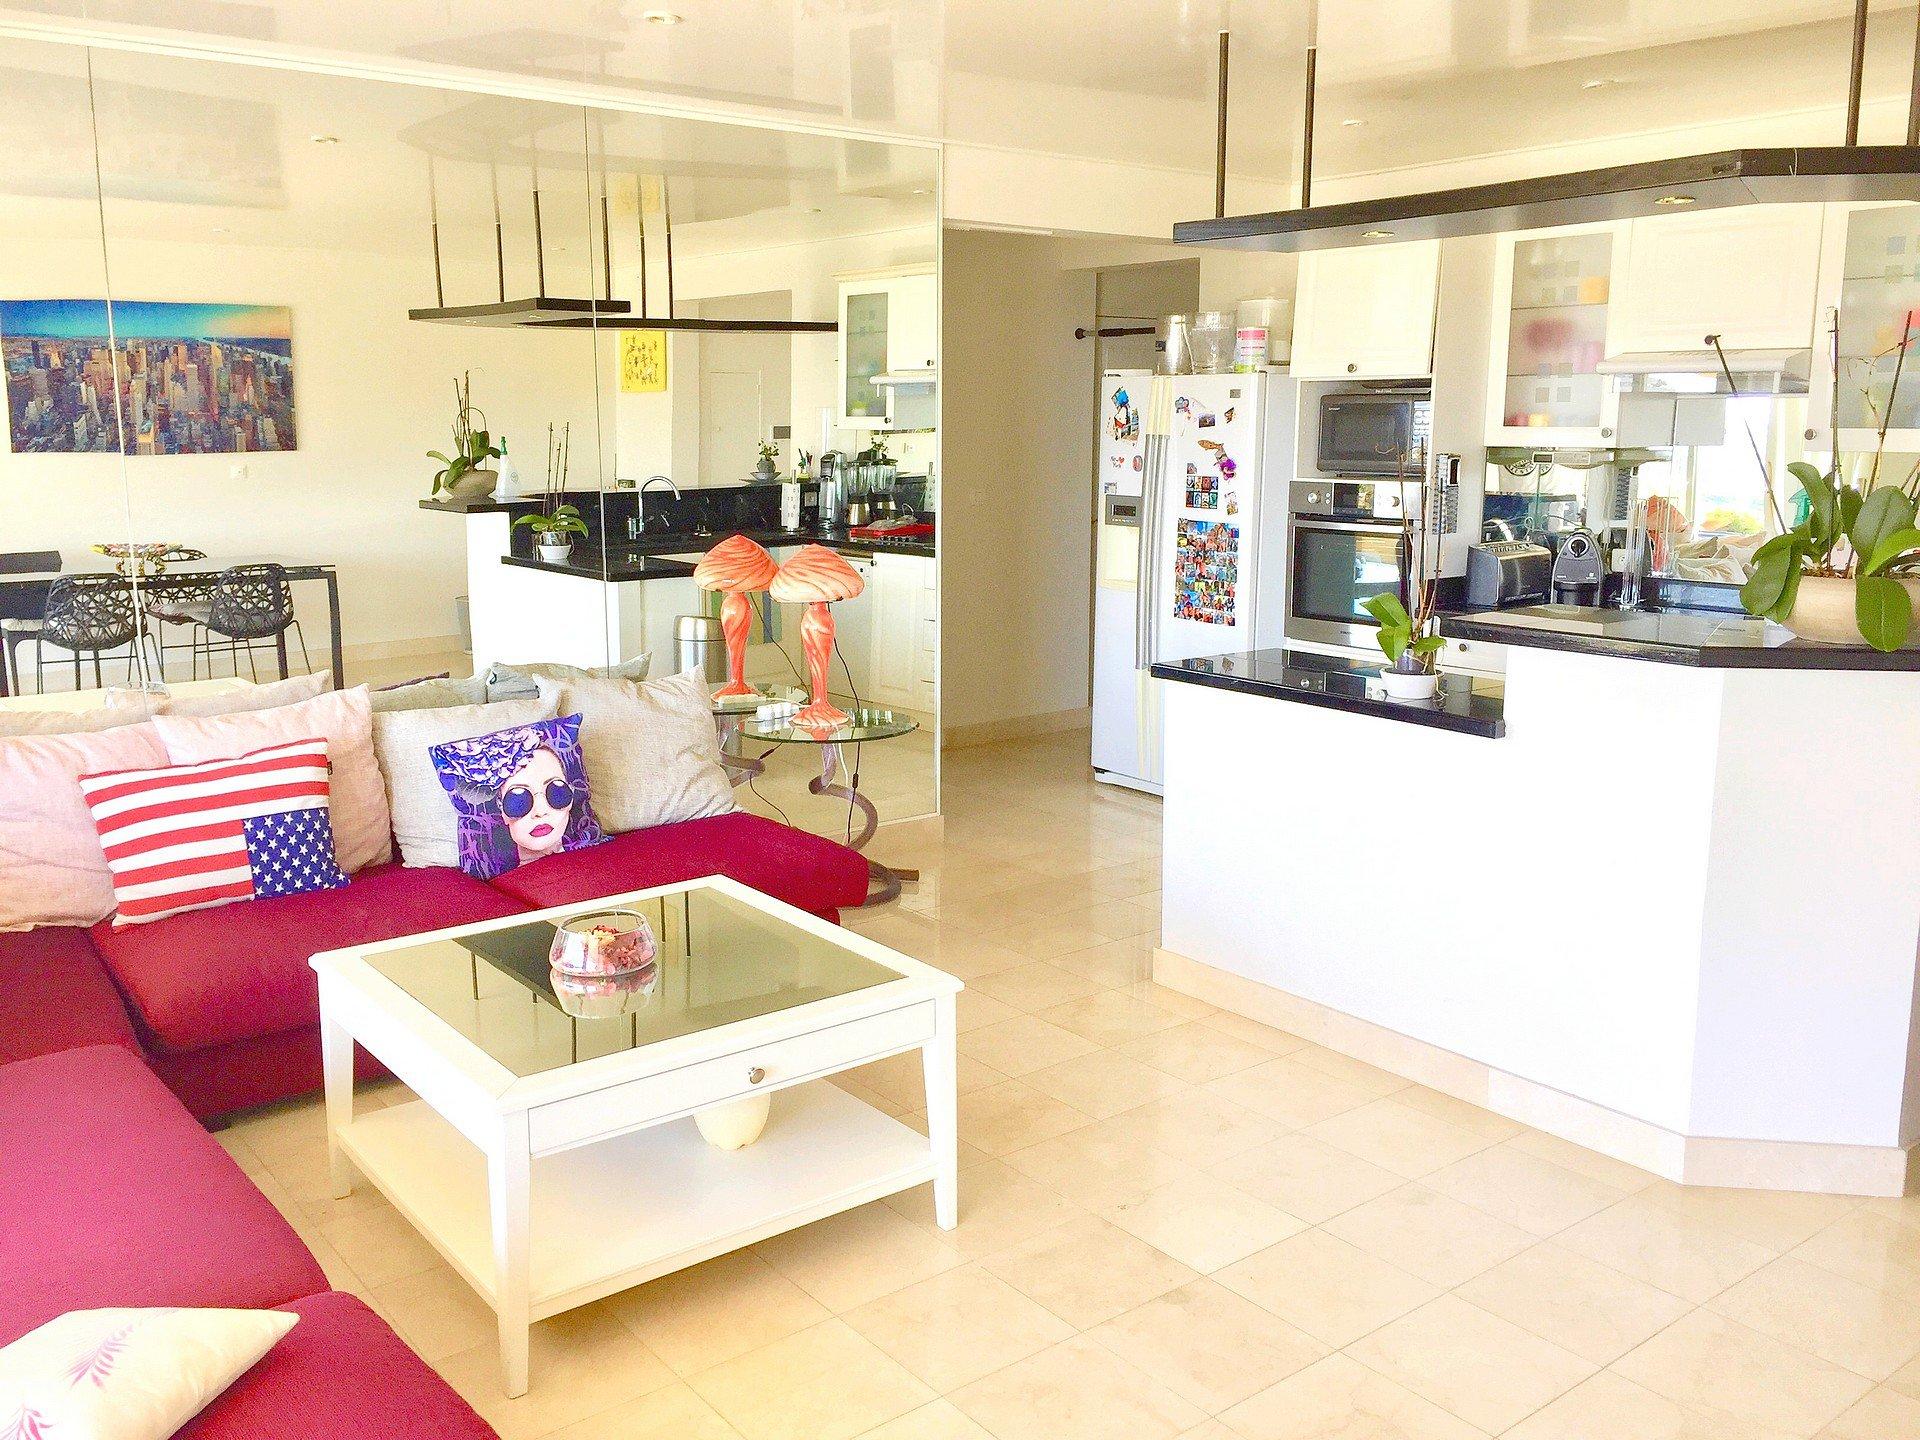 Продажа Апартаменты - Вильнёв-Лубе (Villeneuve-Loubet) Marina Baie des Anges